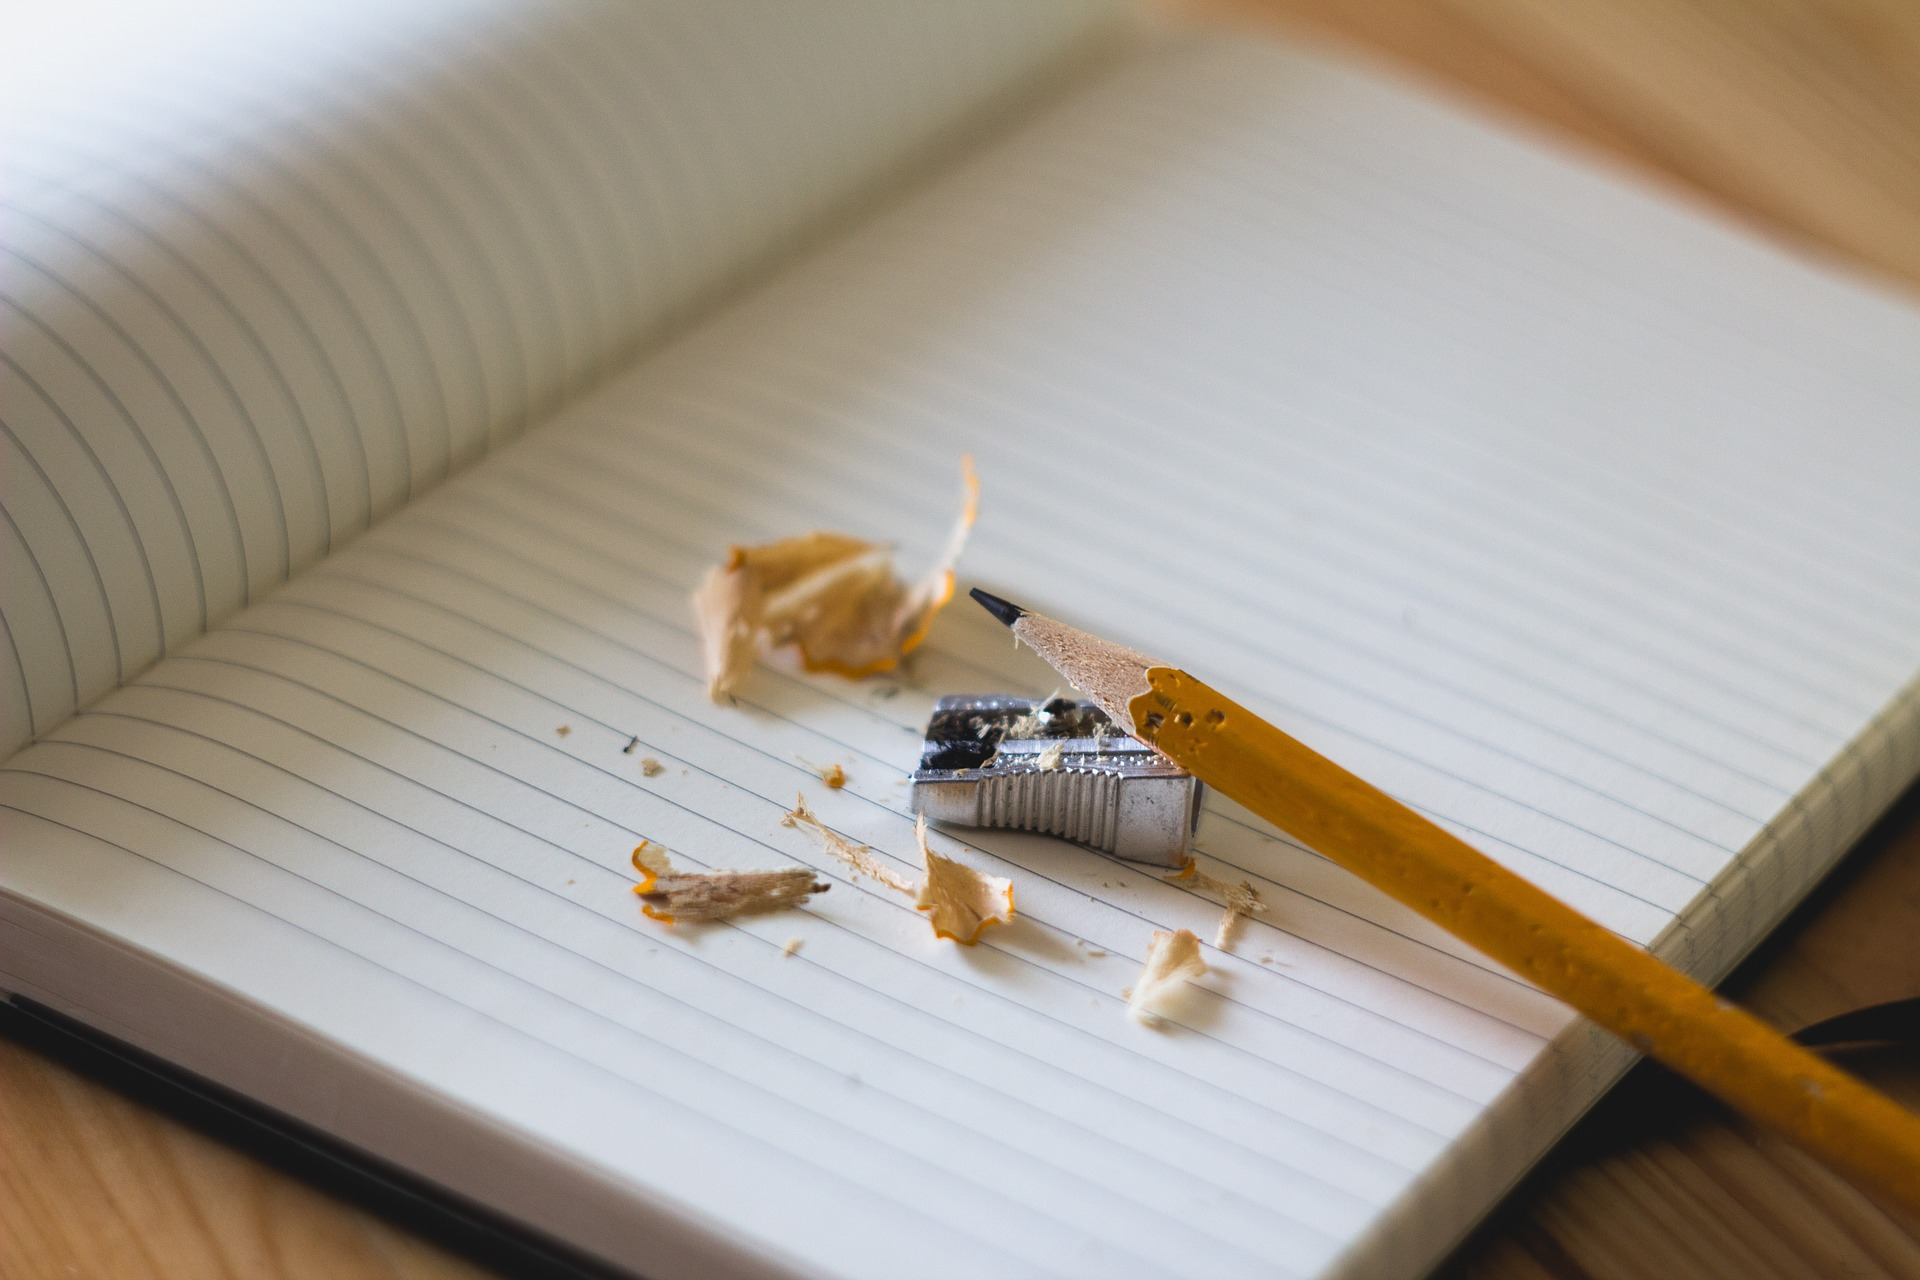 Back To School Made Easier In 6 Simple Steps